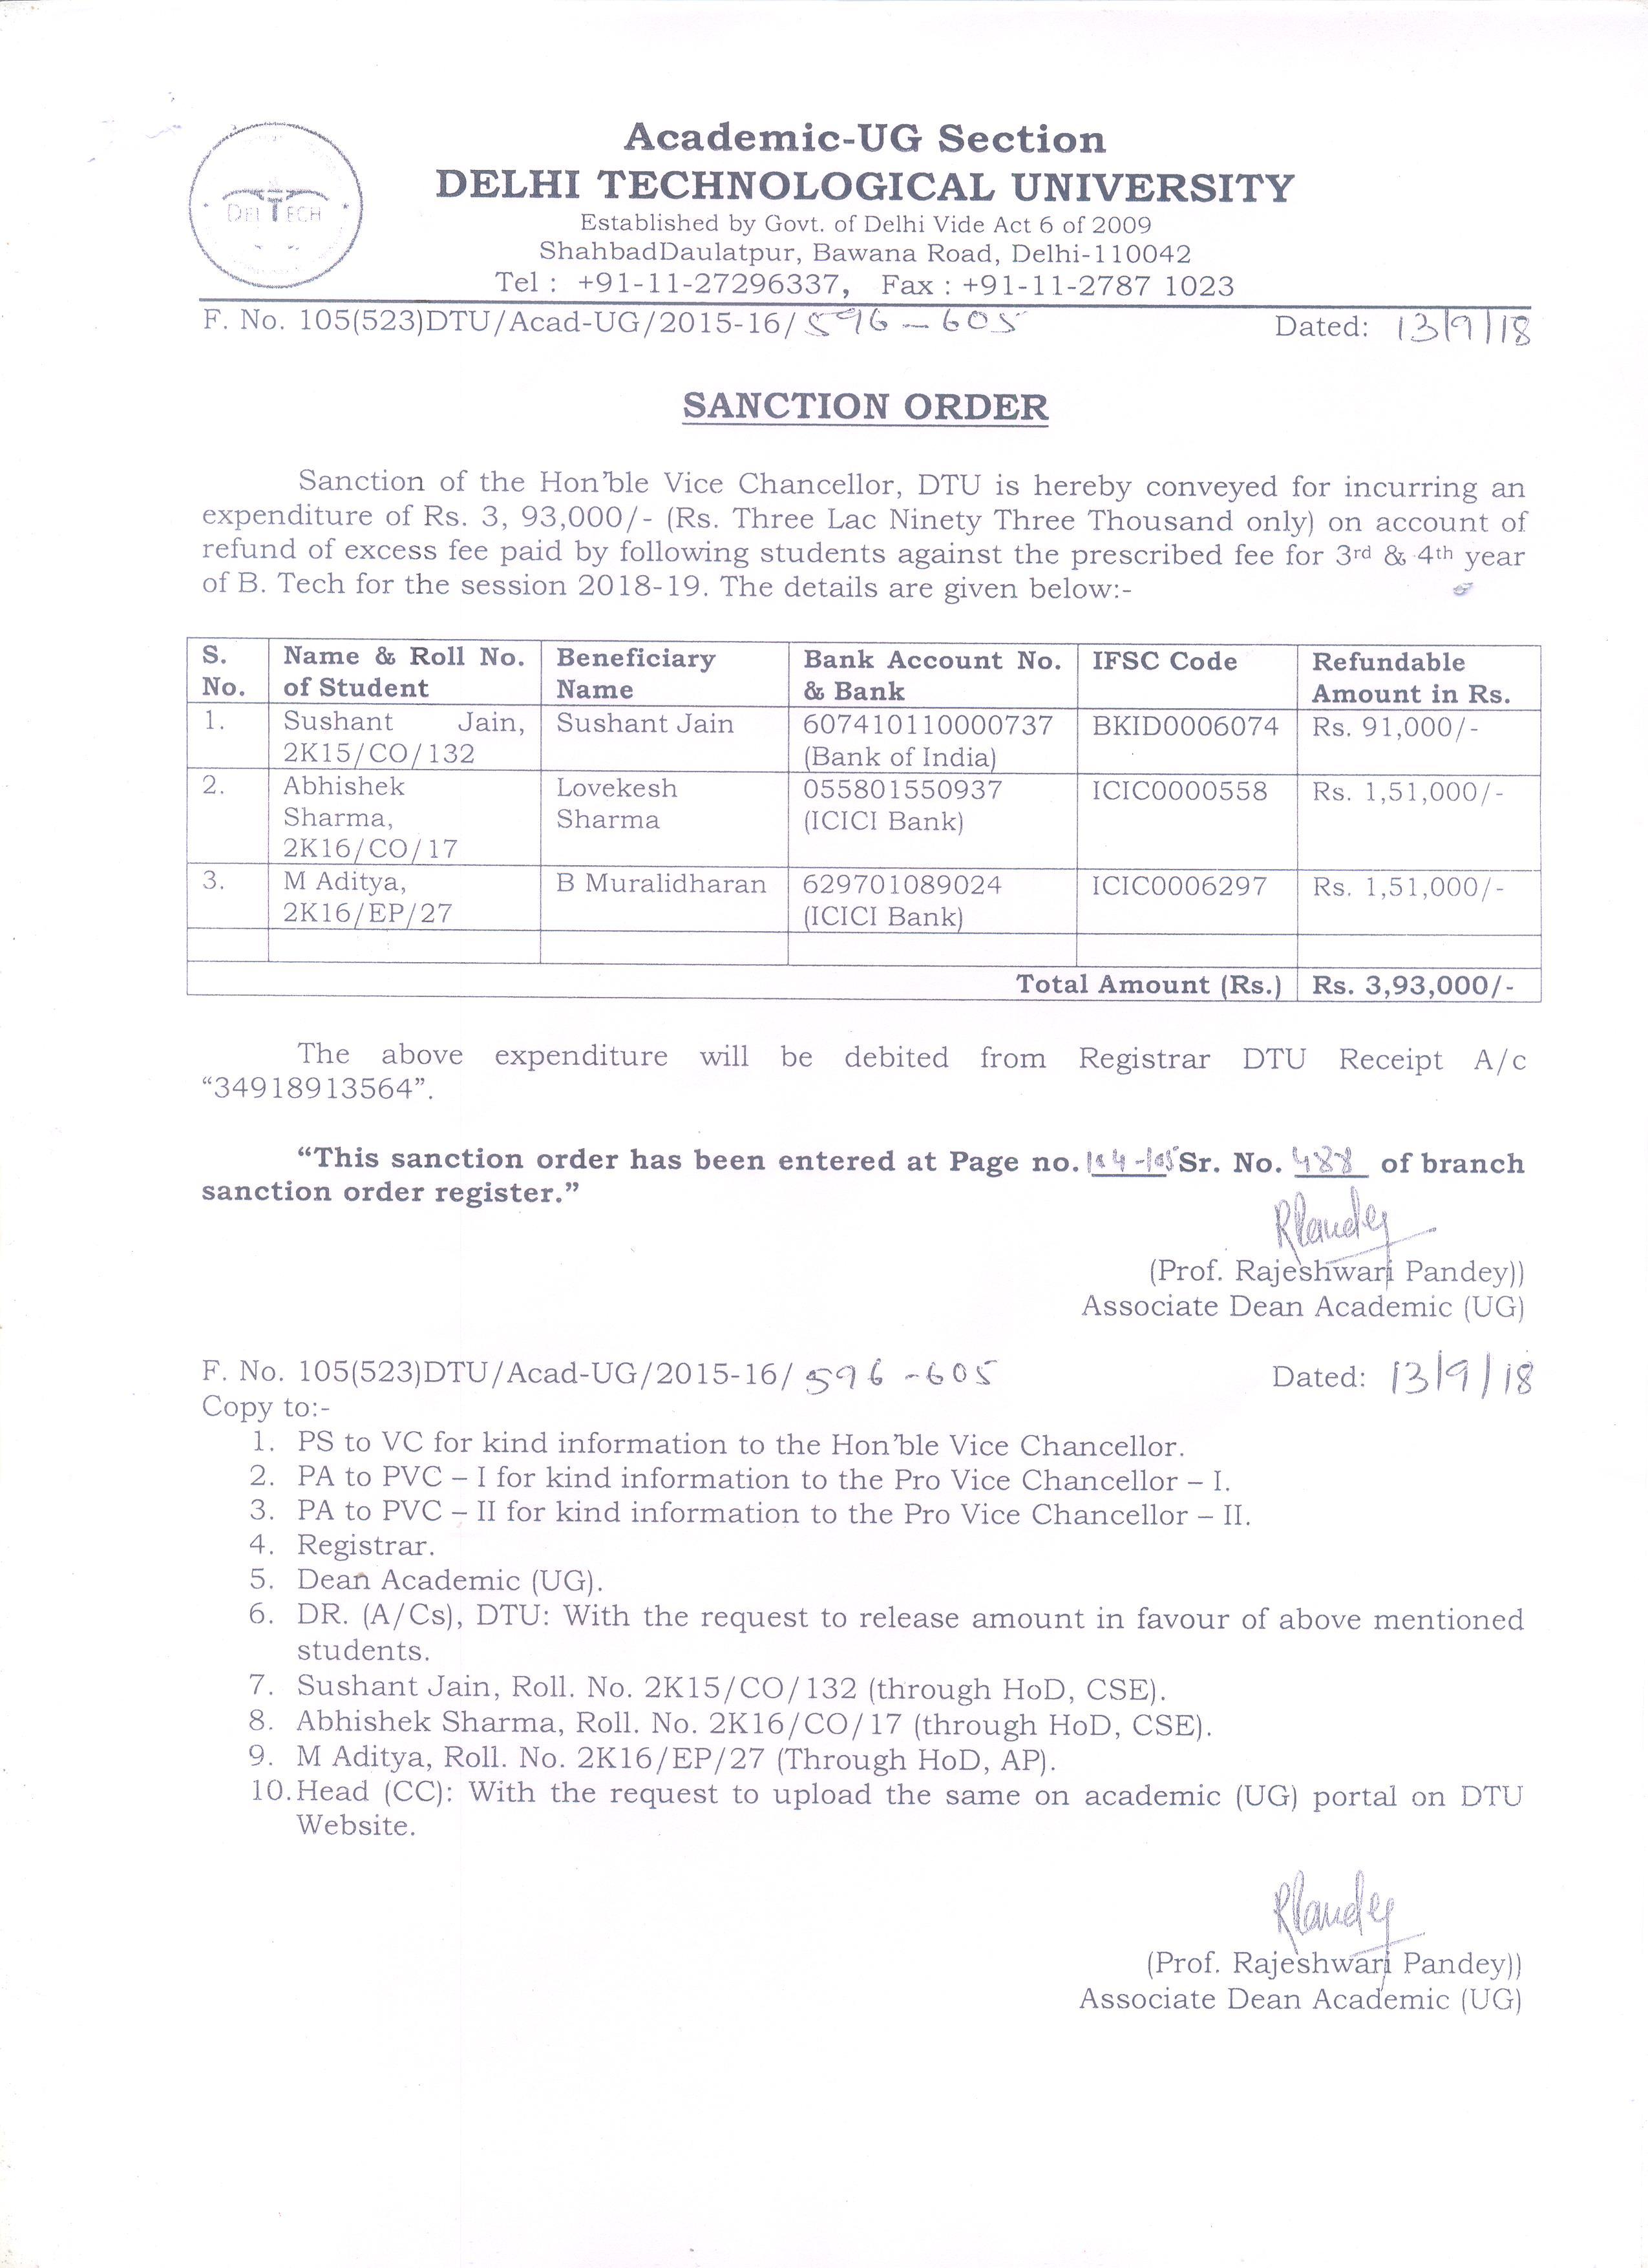 Academic - Notices | Delhi Technological University